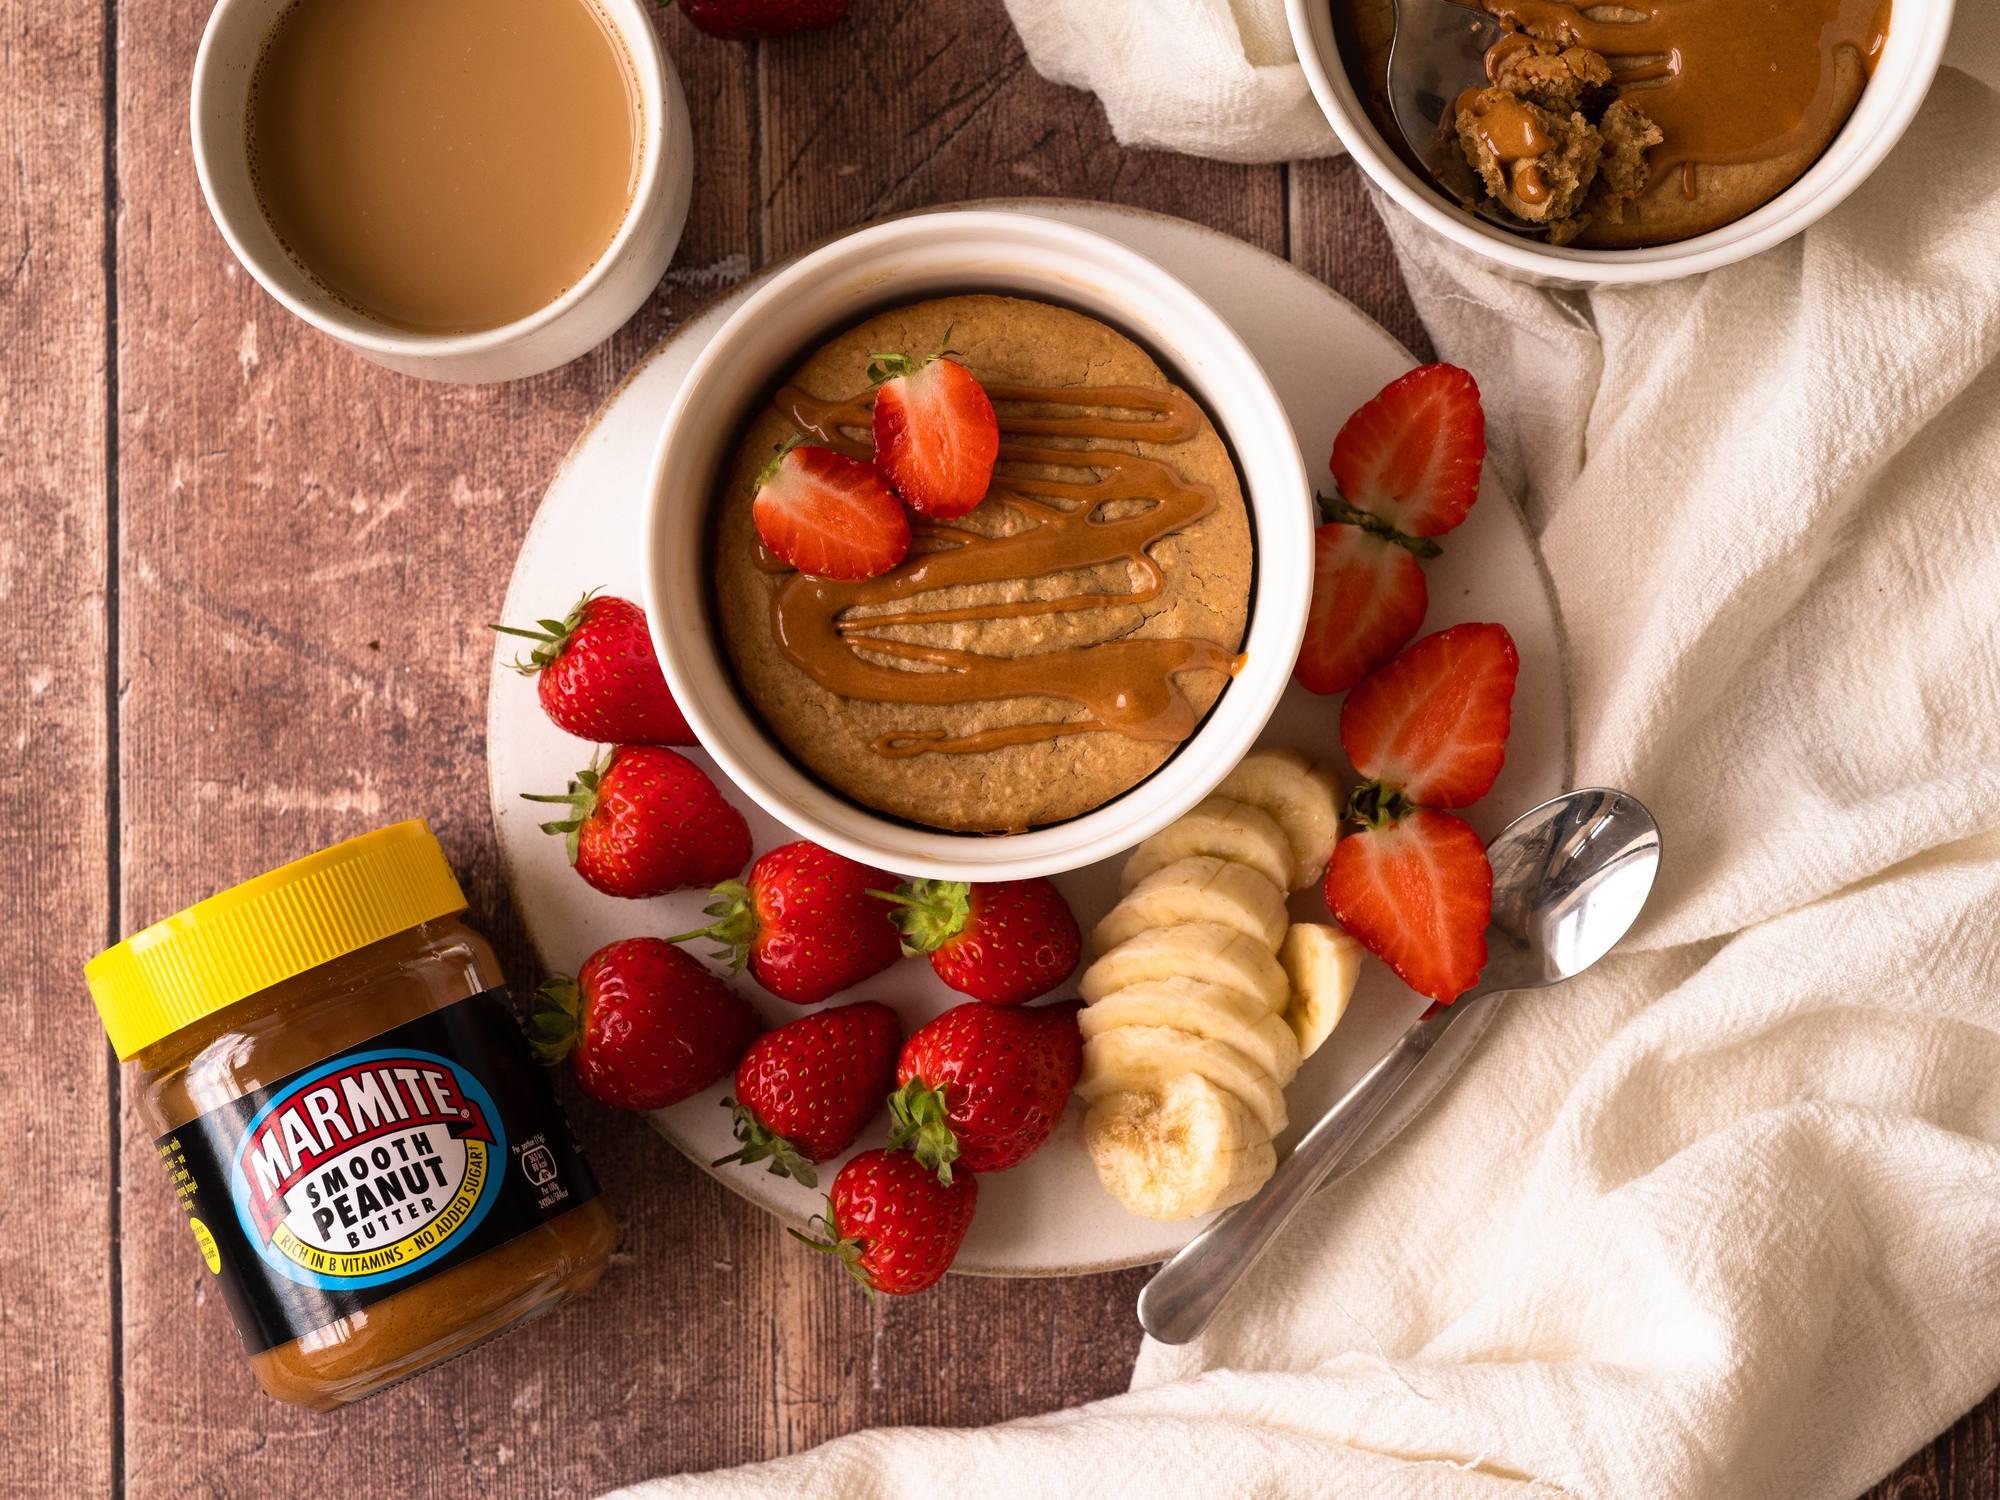 Marmite Peanut Butter Baked Oats